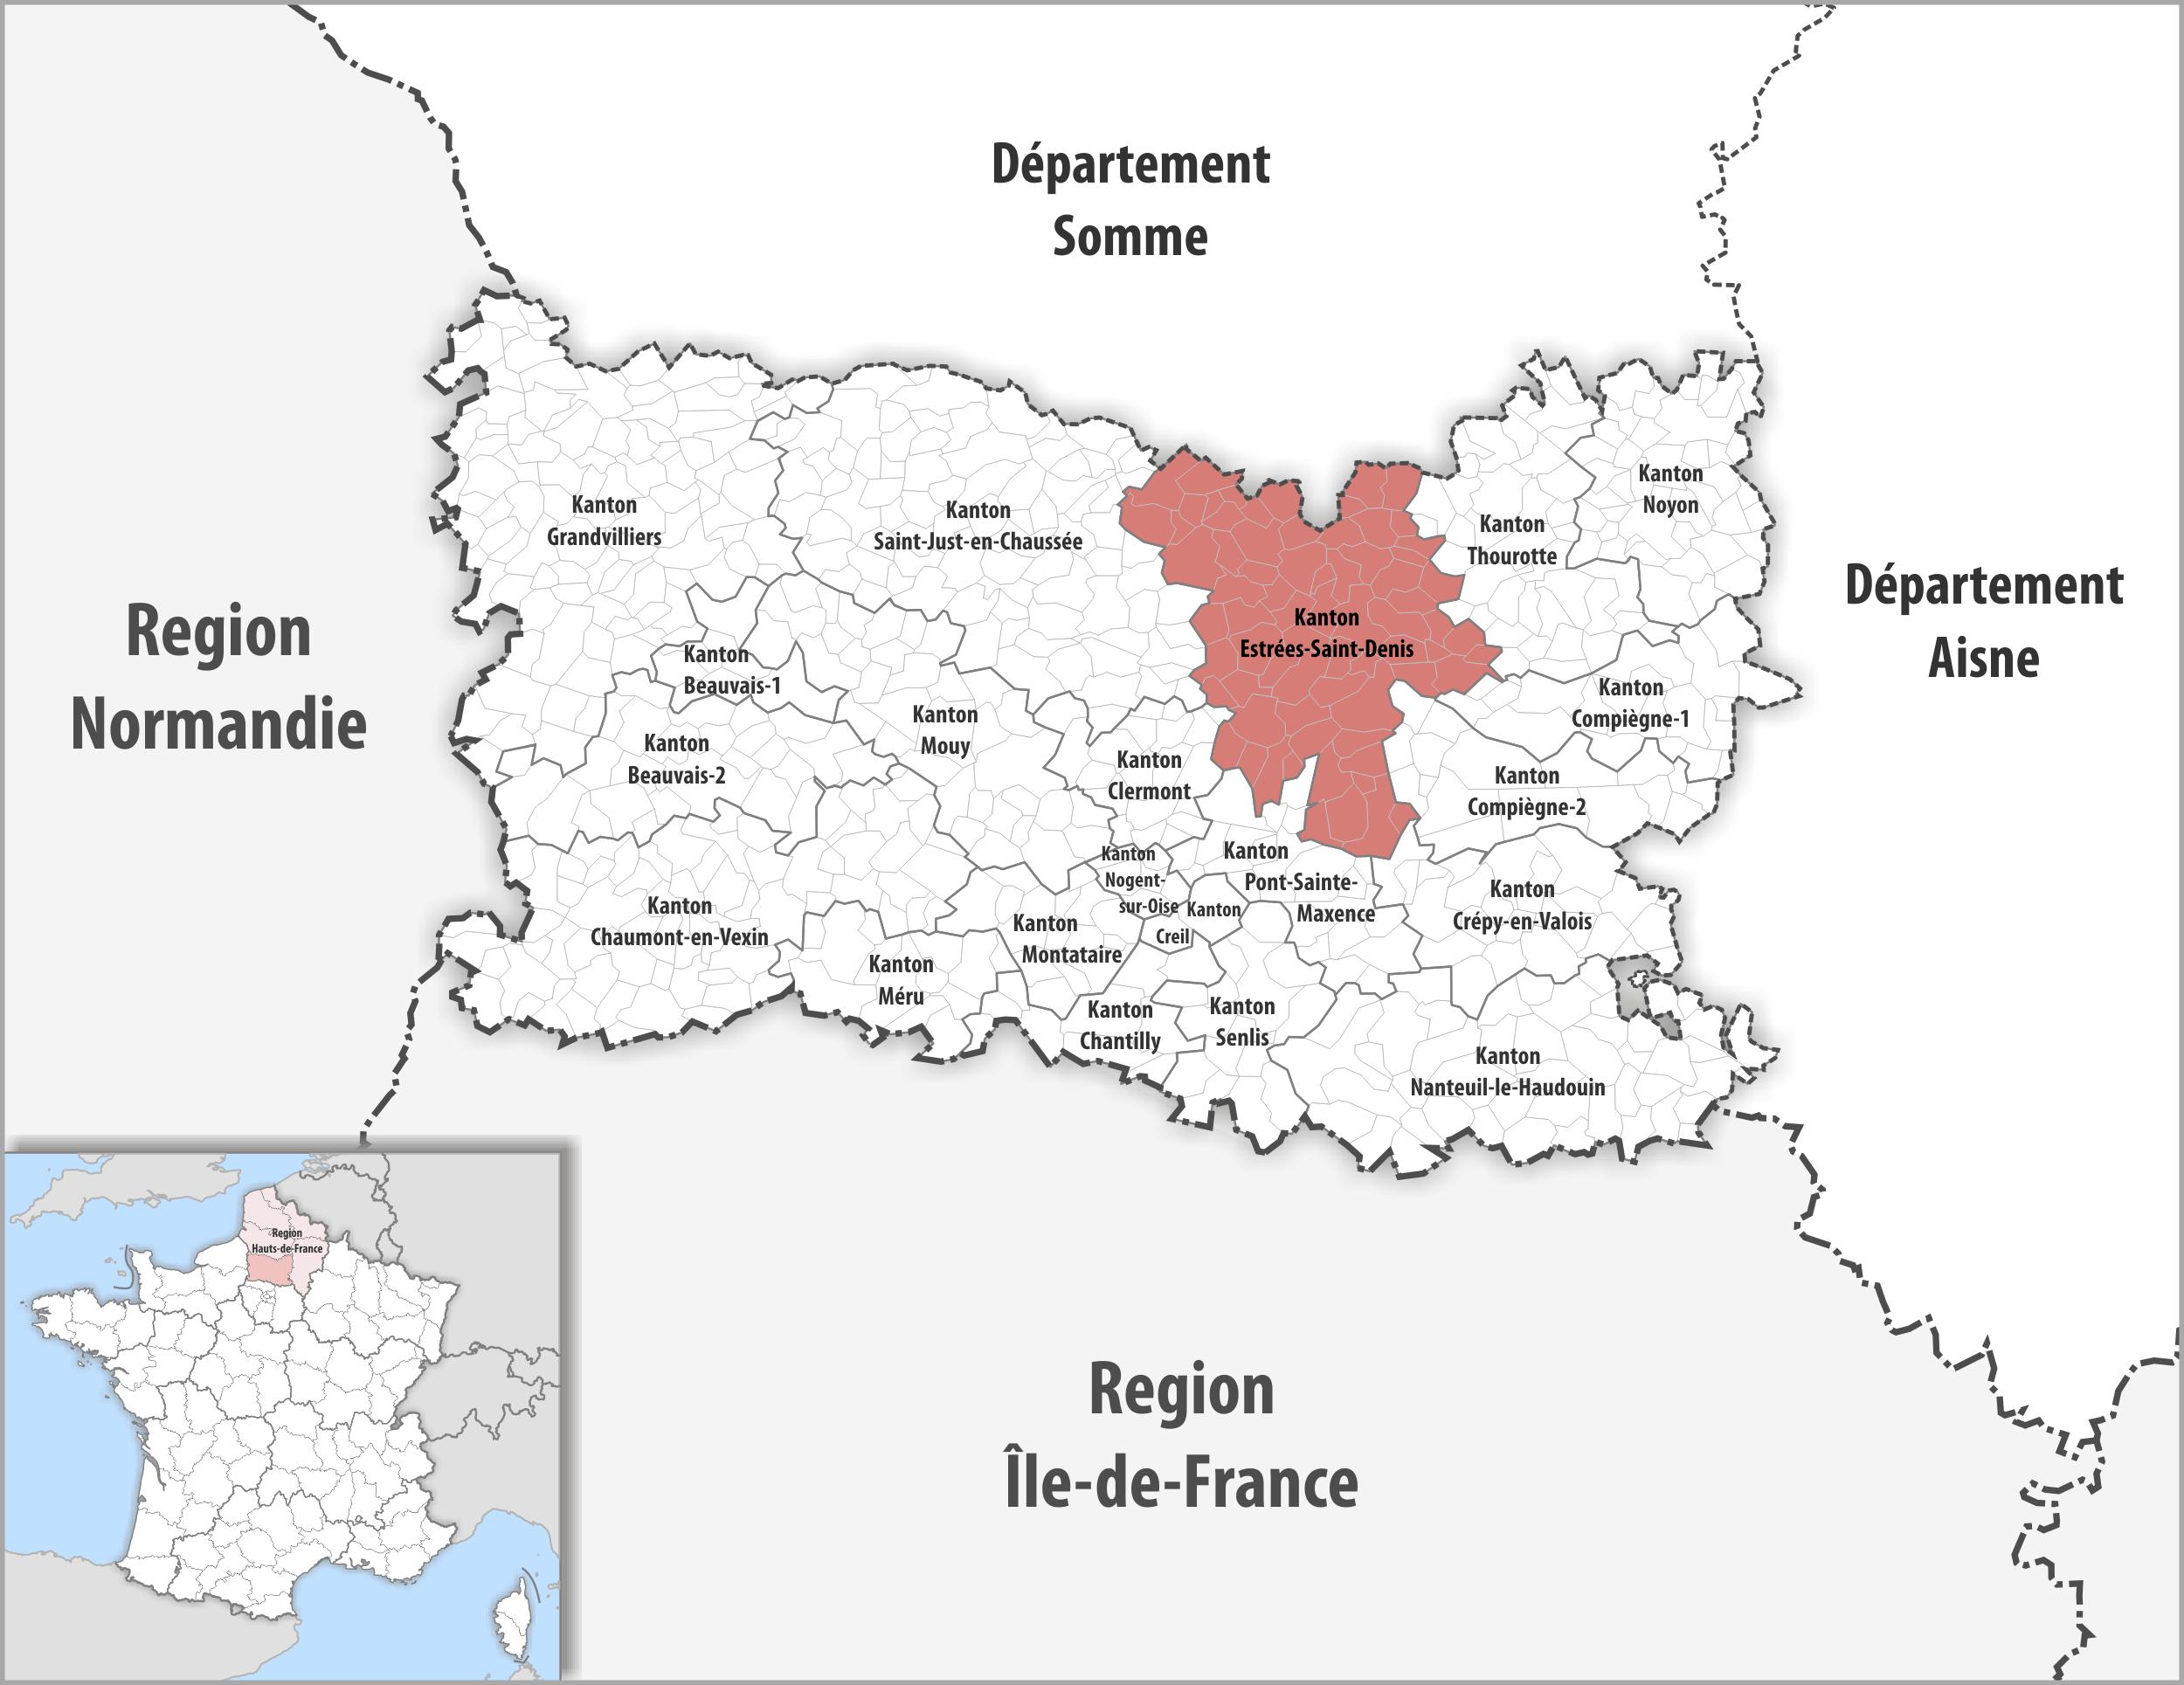 Saint Denis France Map.File Locator Map Of Kanton Estrees Saint Denis 2018 Png Wikimedia